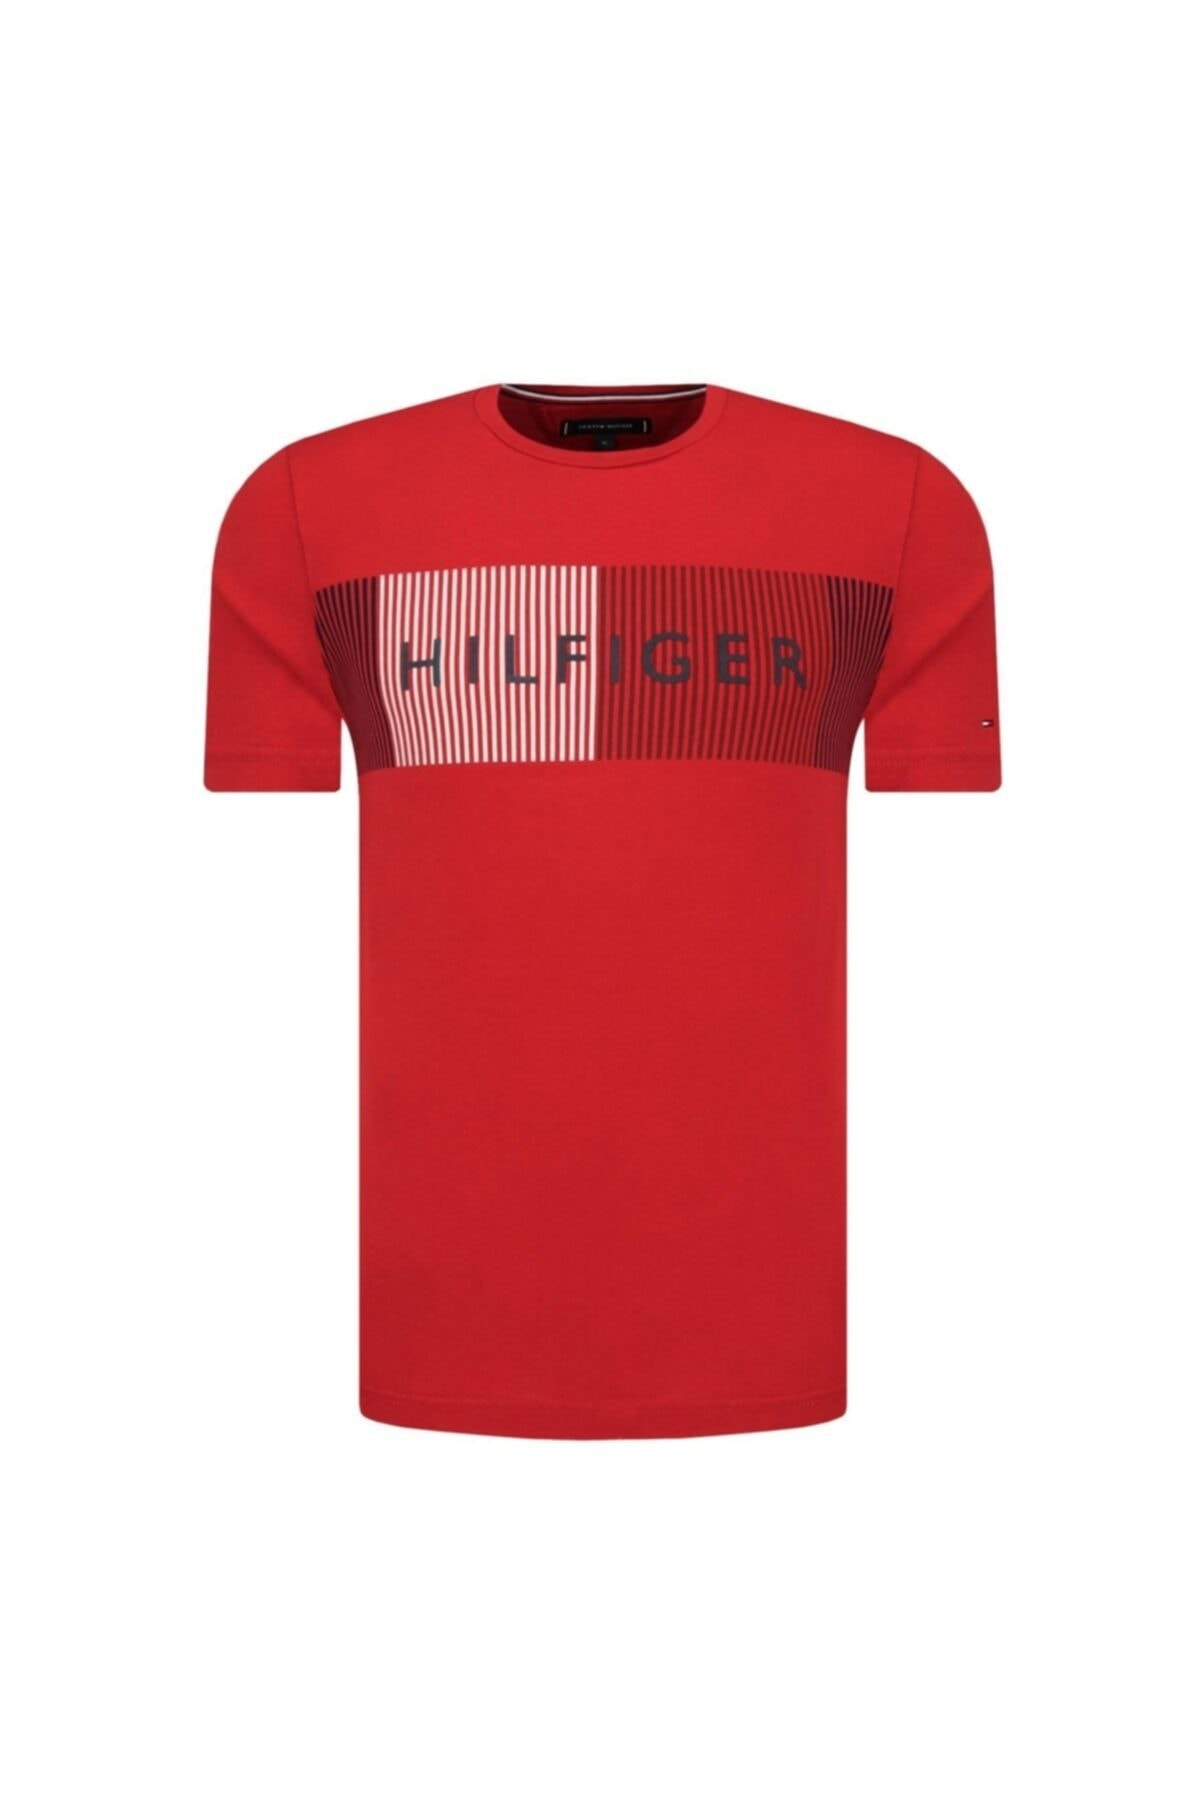 Tommy Hilfiger Tommy Hılfıger T-shirt Kırmızı Mw0mw10829 1